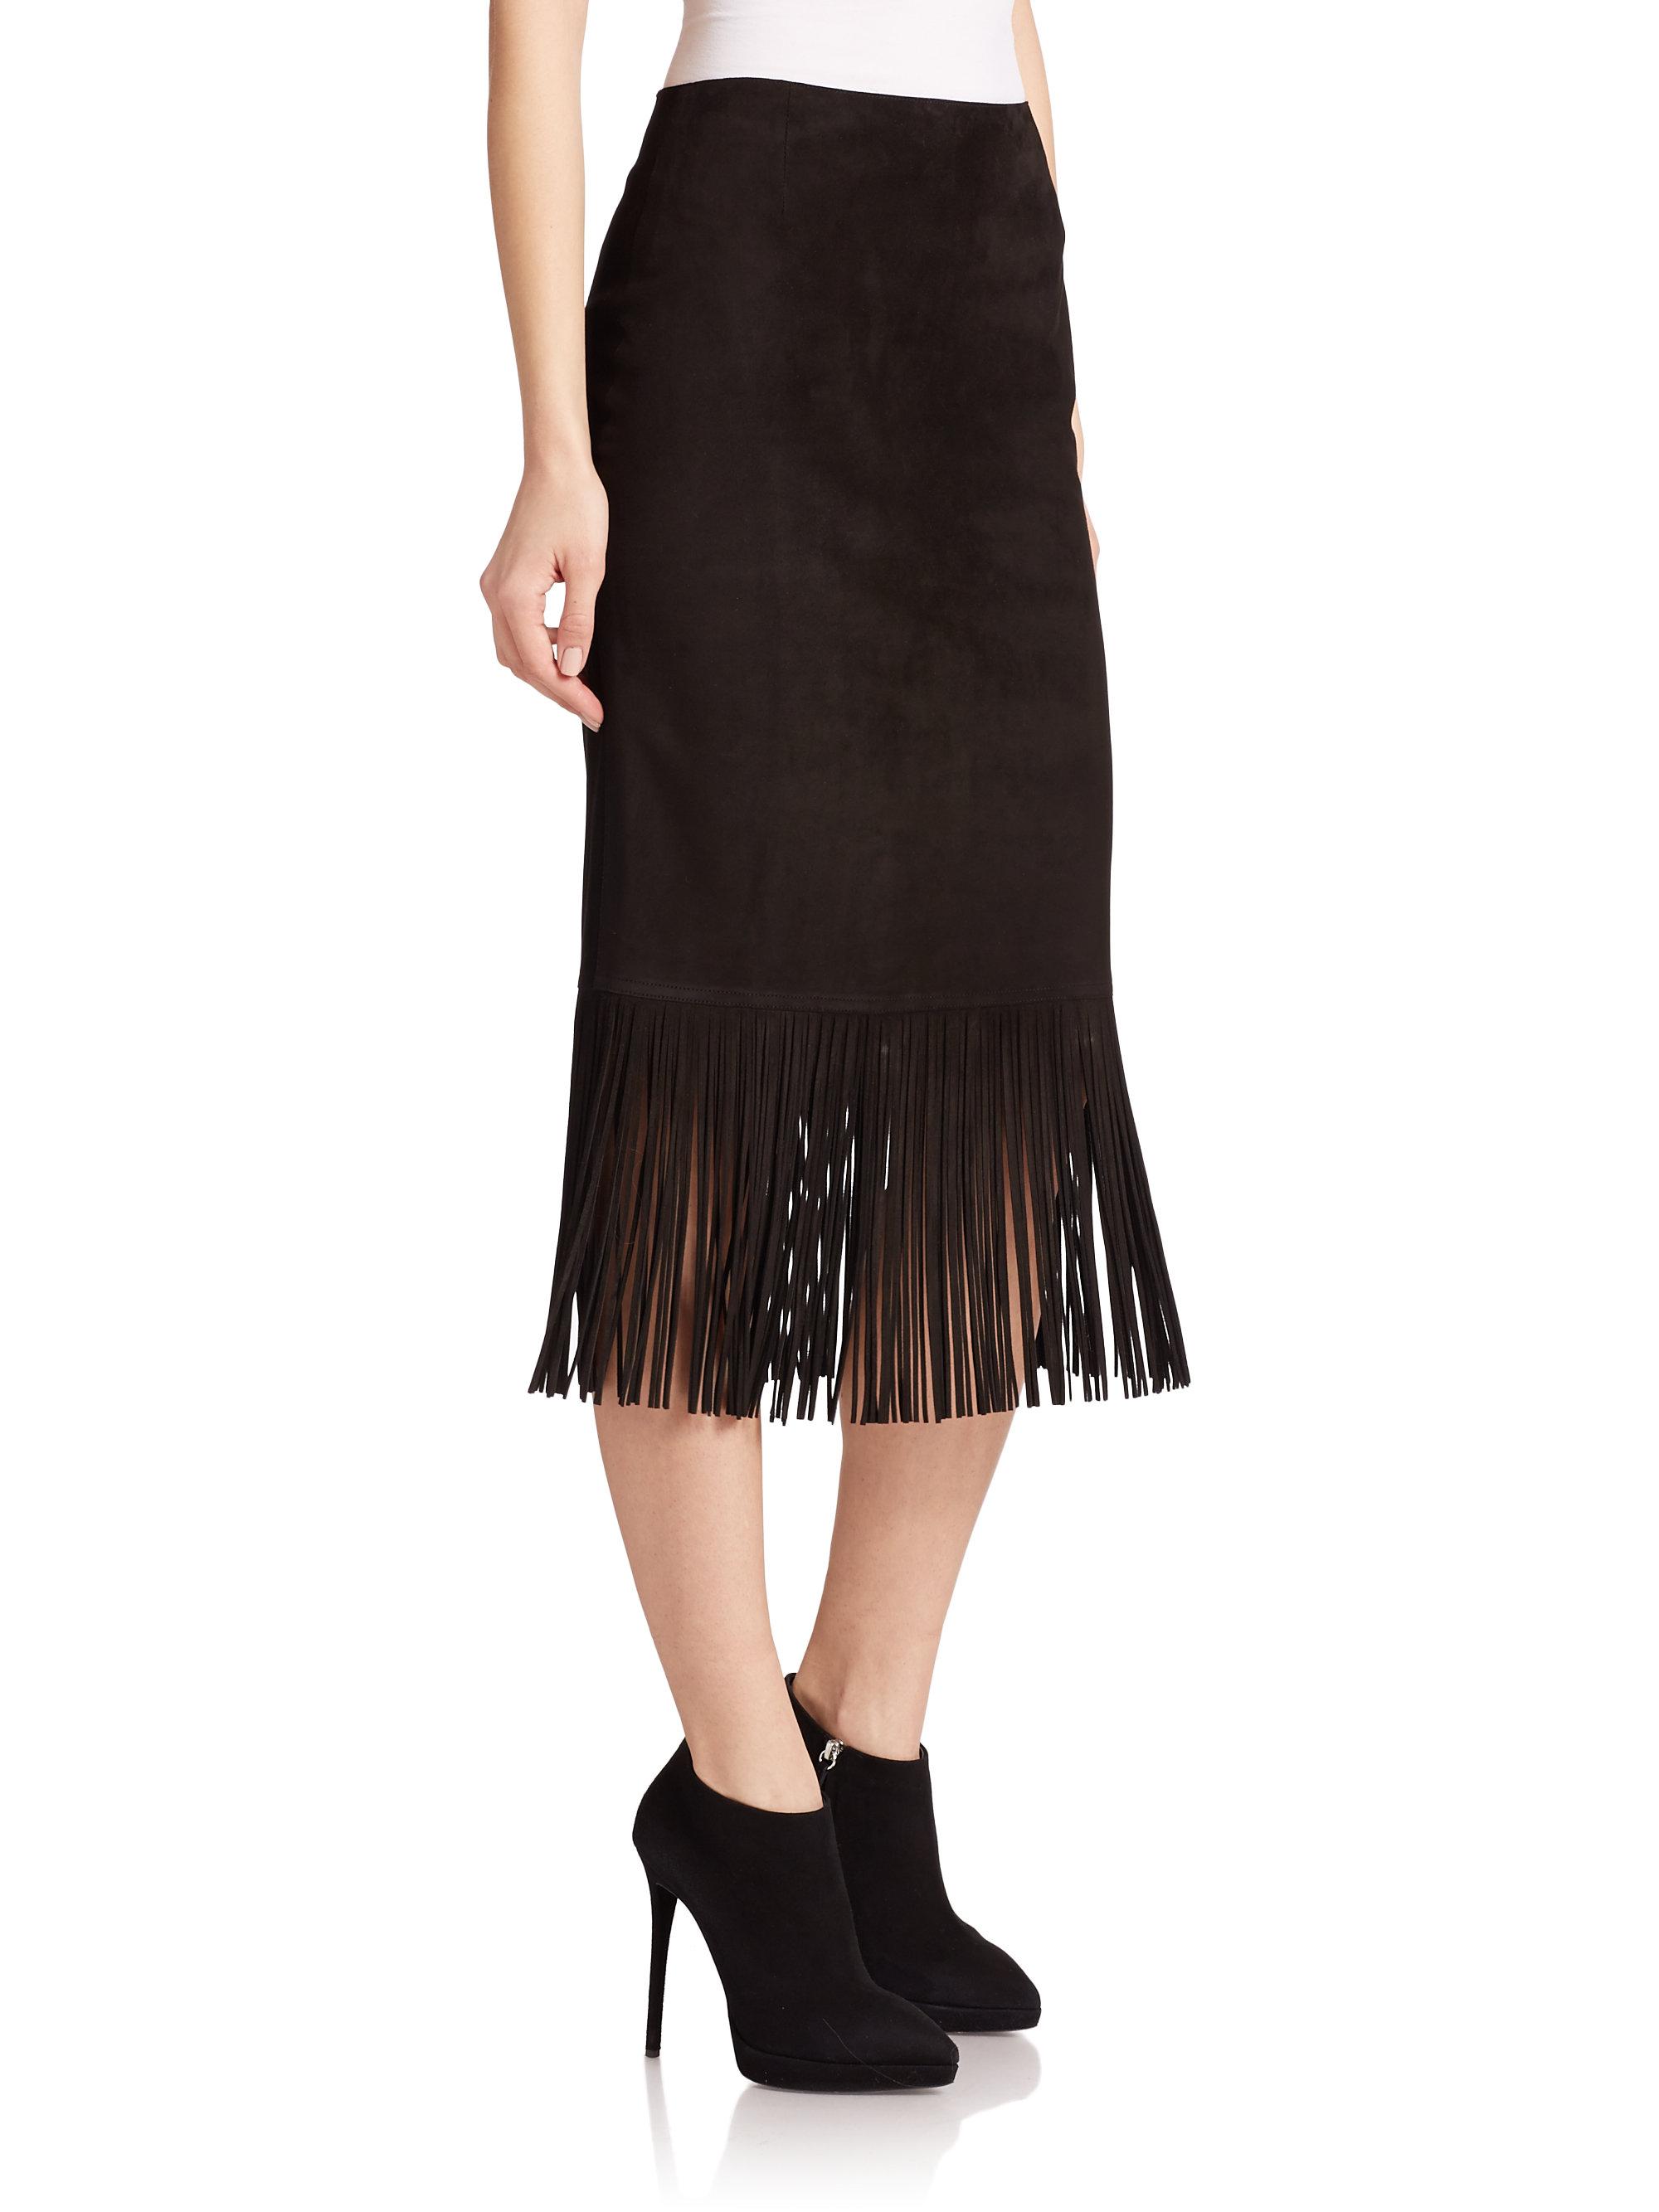 Akris punto Suede Fringe Pencil Skirt in Black | Lyst